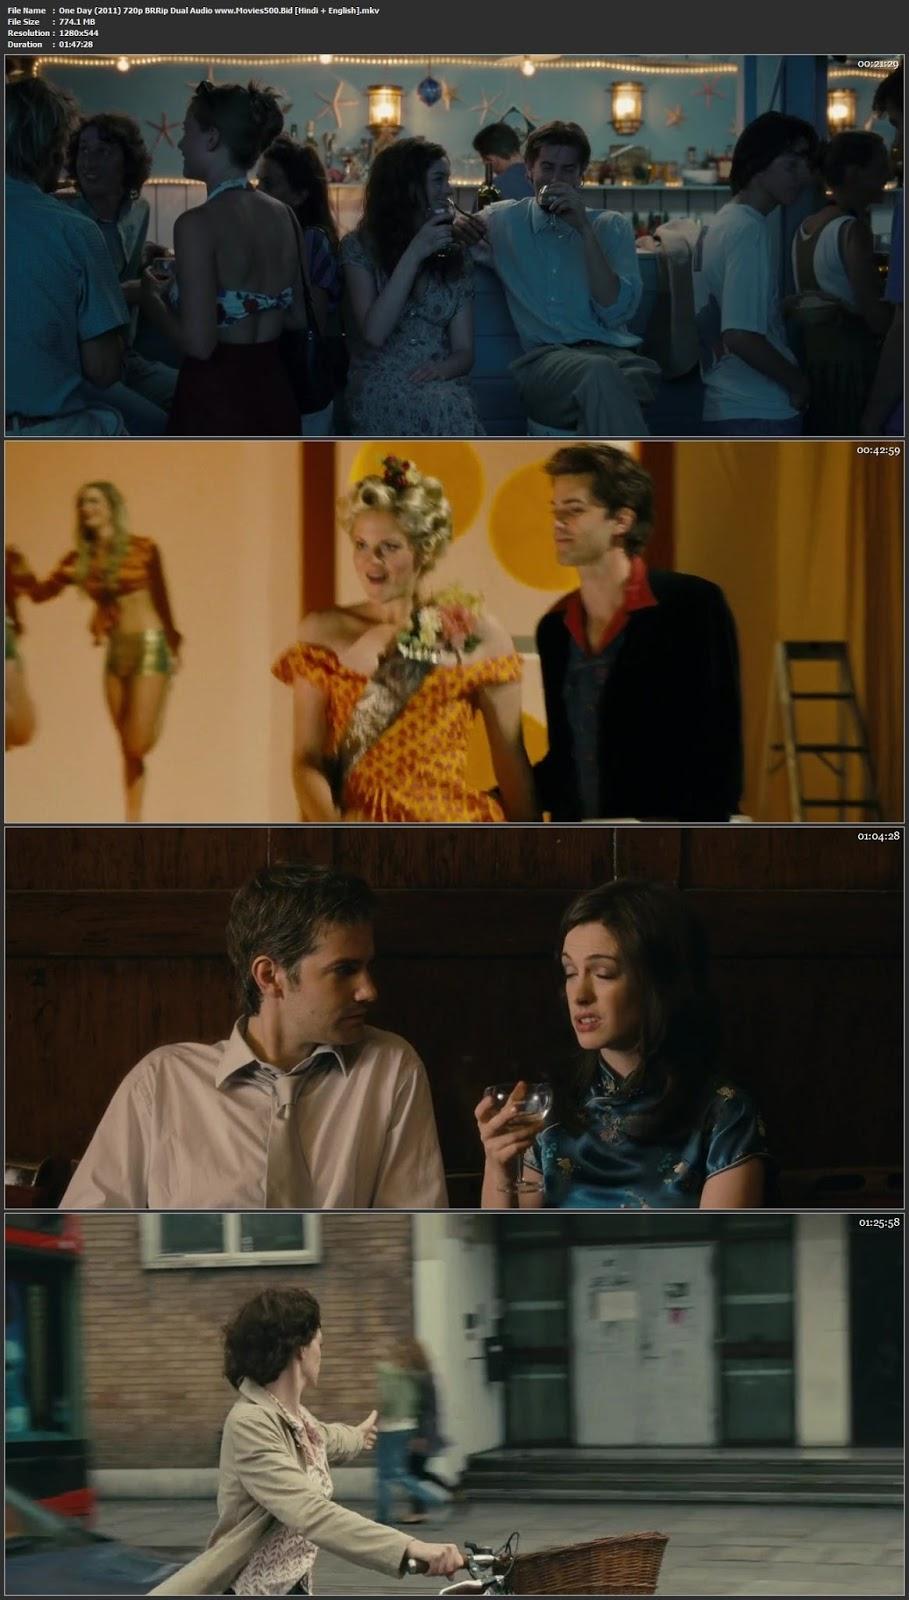 One Day 2011 Dual Audio Full Movie BluRay 720p at 9966132.com